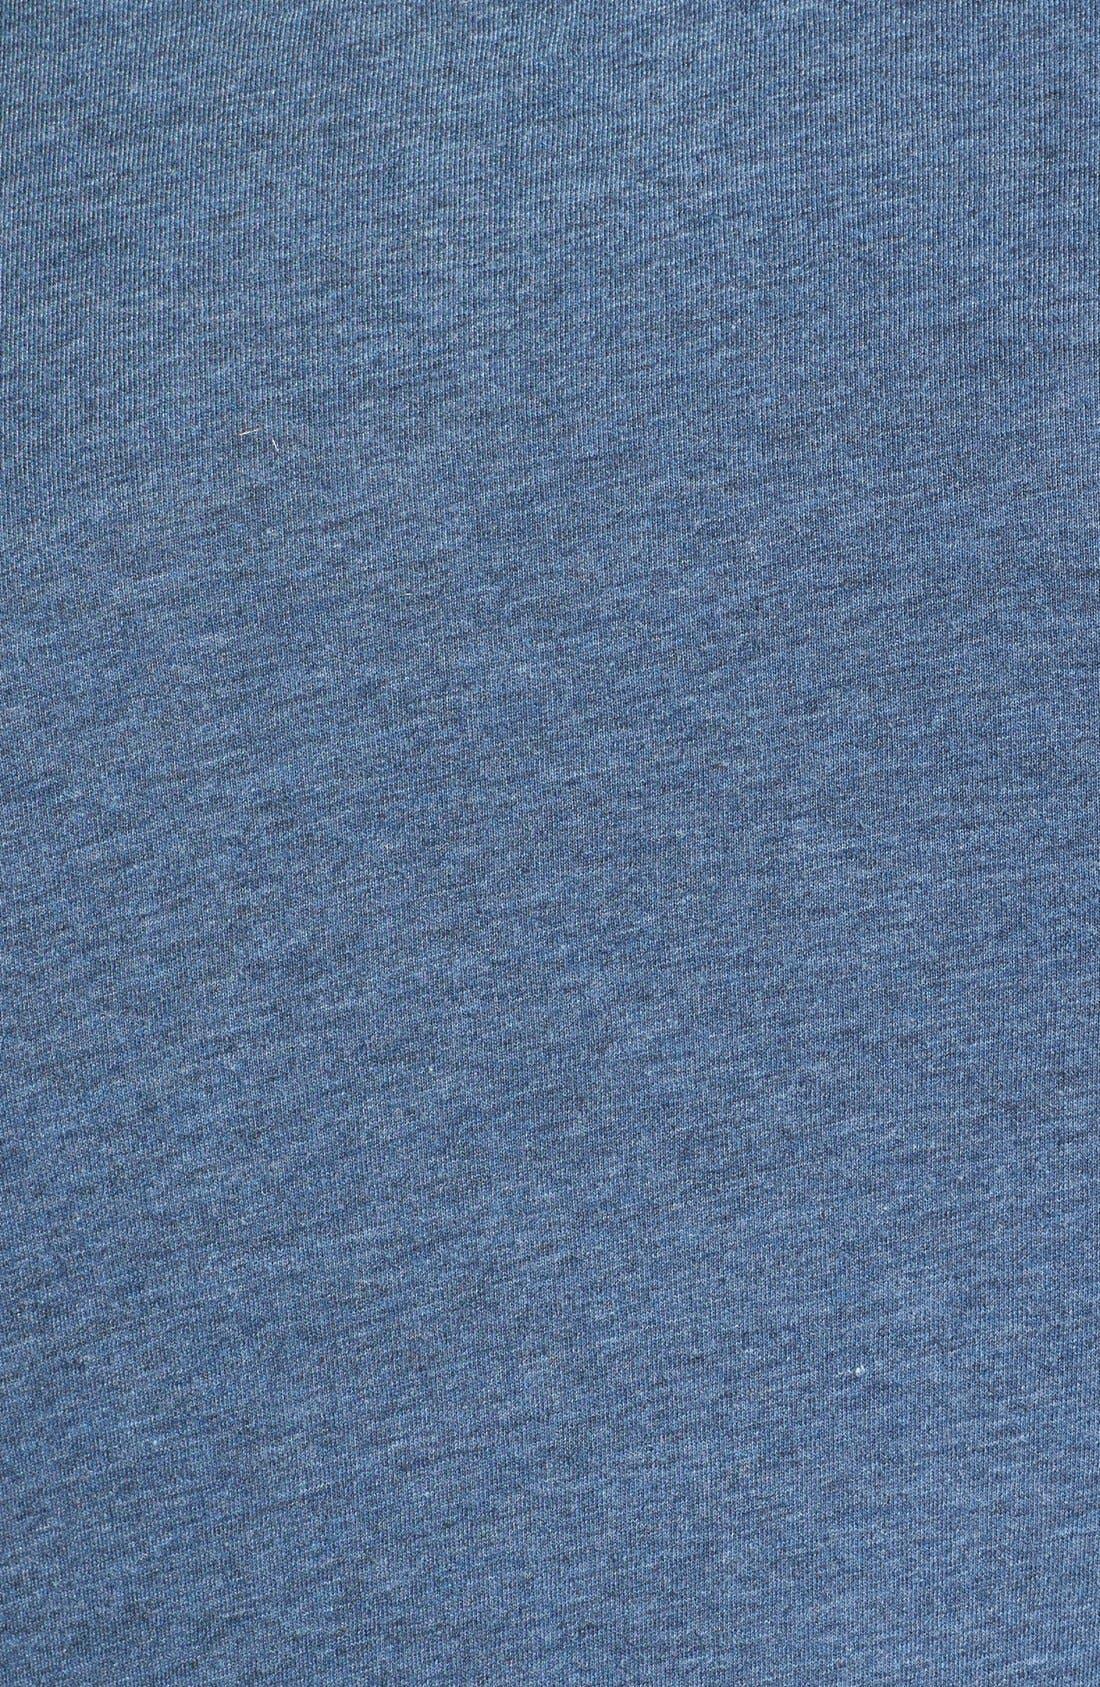 Alternate Image 3  - Retro Brand 'UCLA Bruins' Mélange T-Shirt